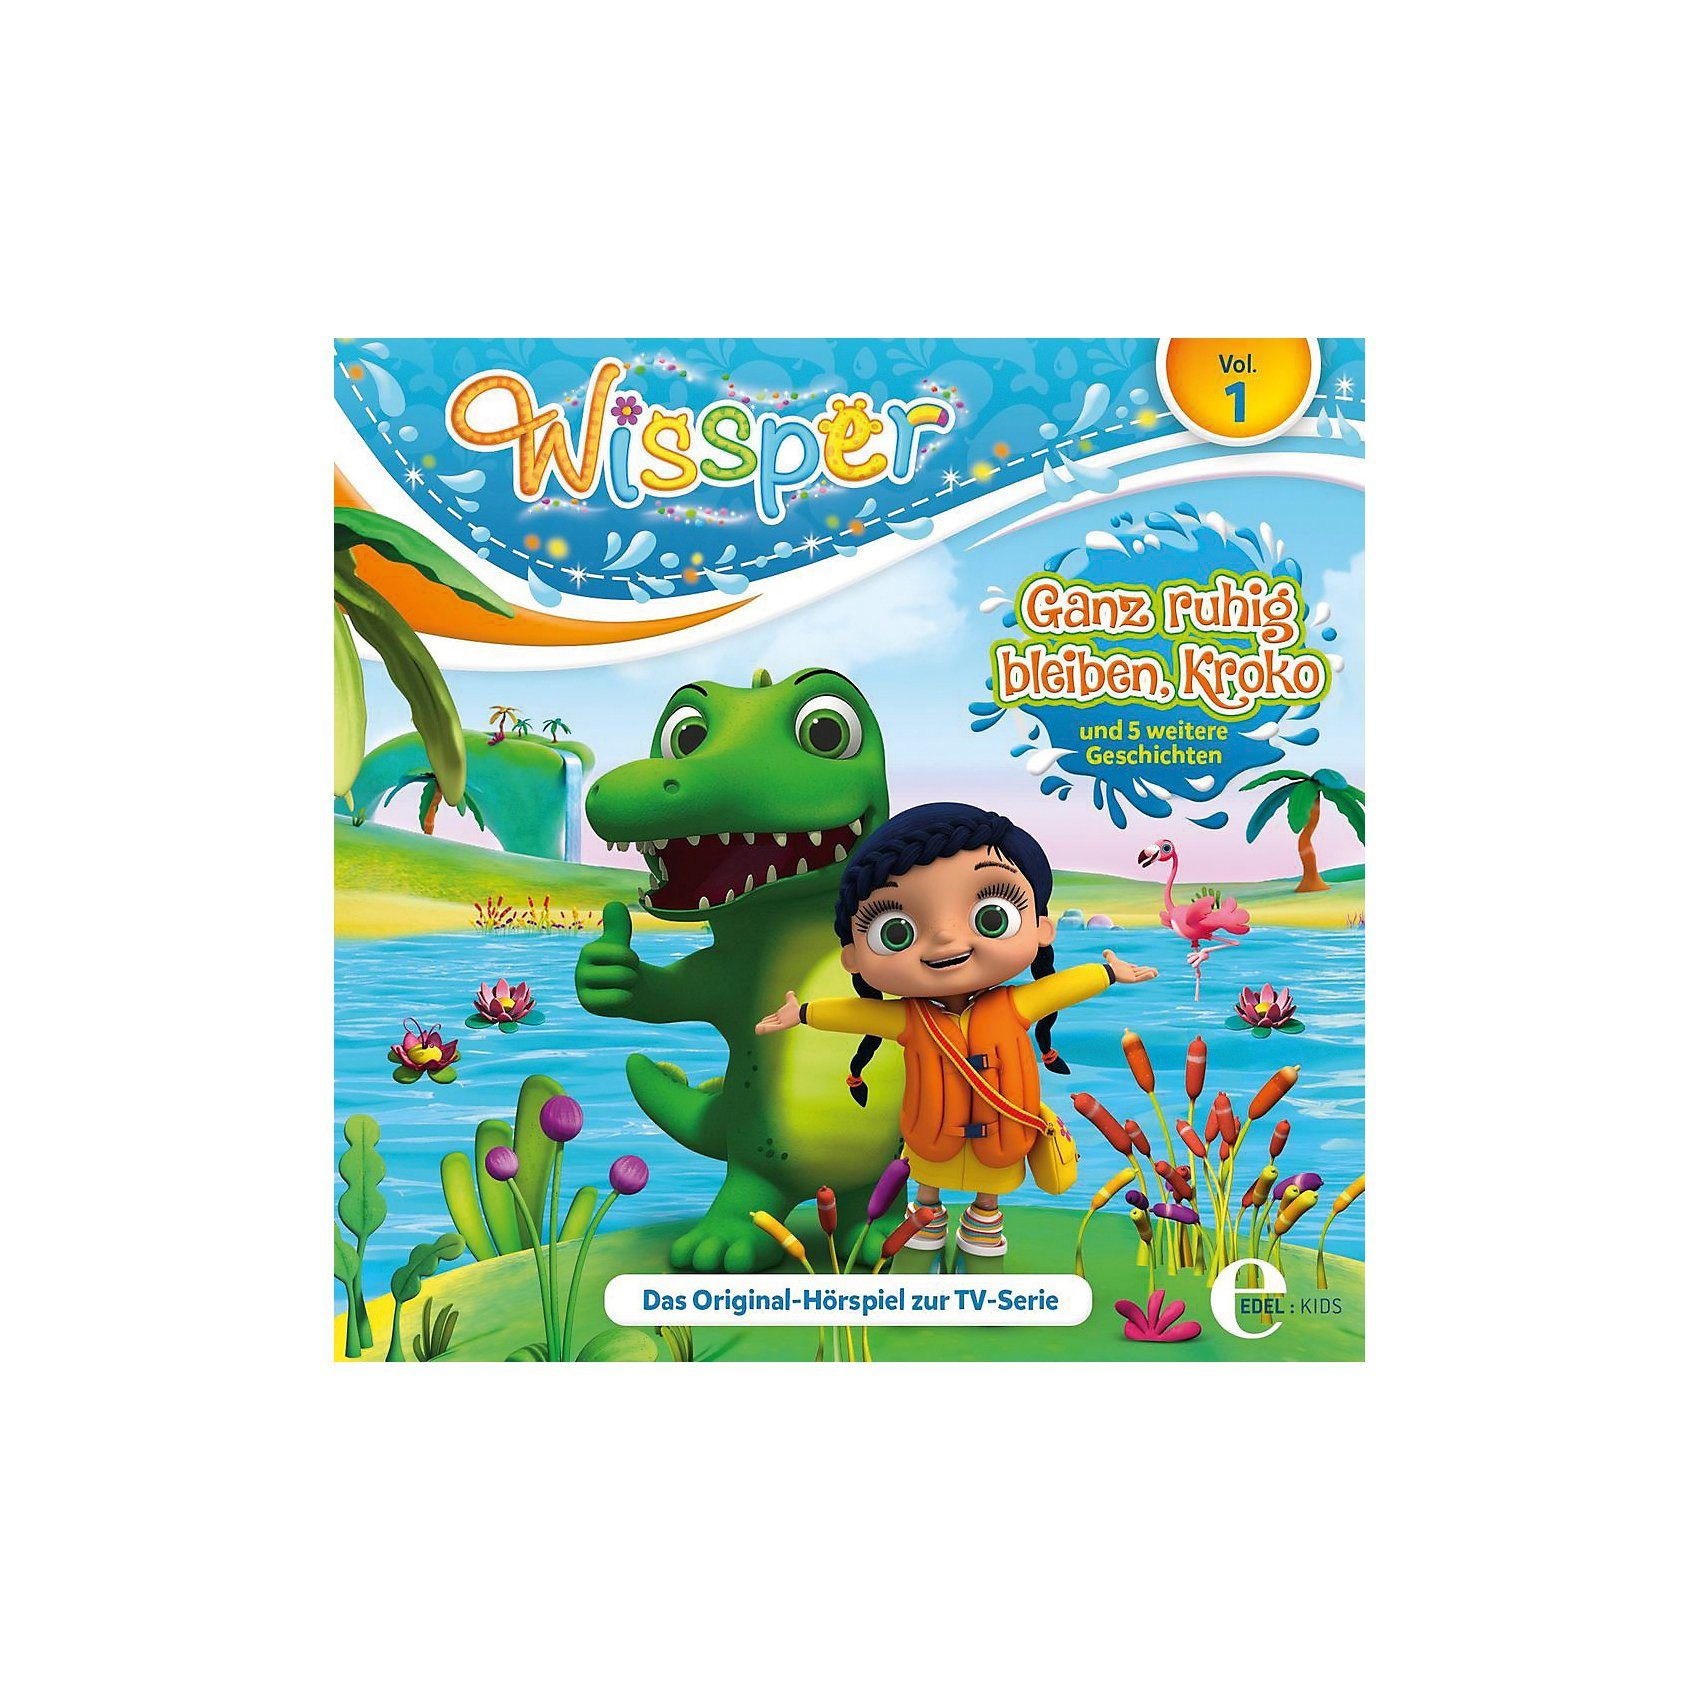 Edel CD Wissper 1 - Ganz Ruhig Bleiben, Kroko